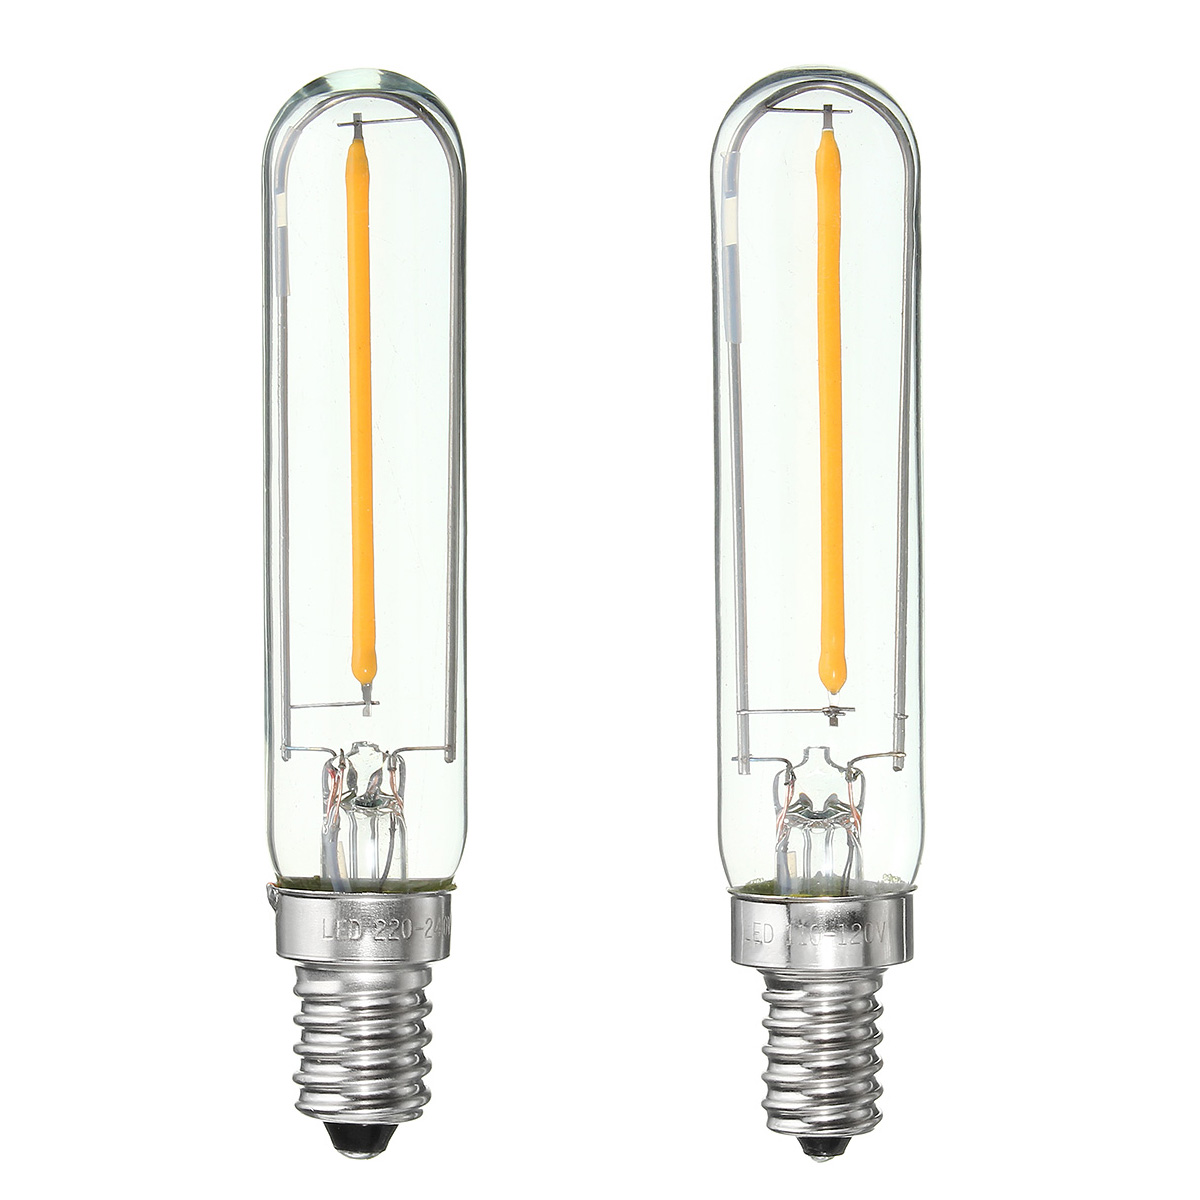 2 Watt Led Light Bulb